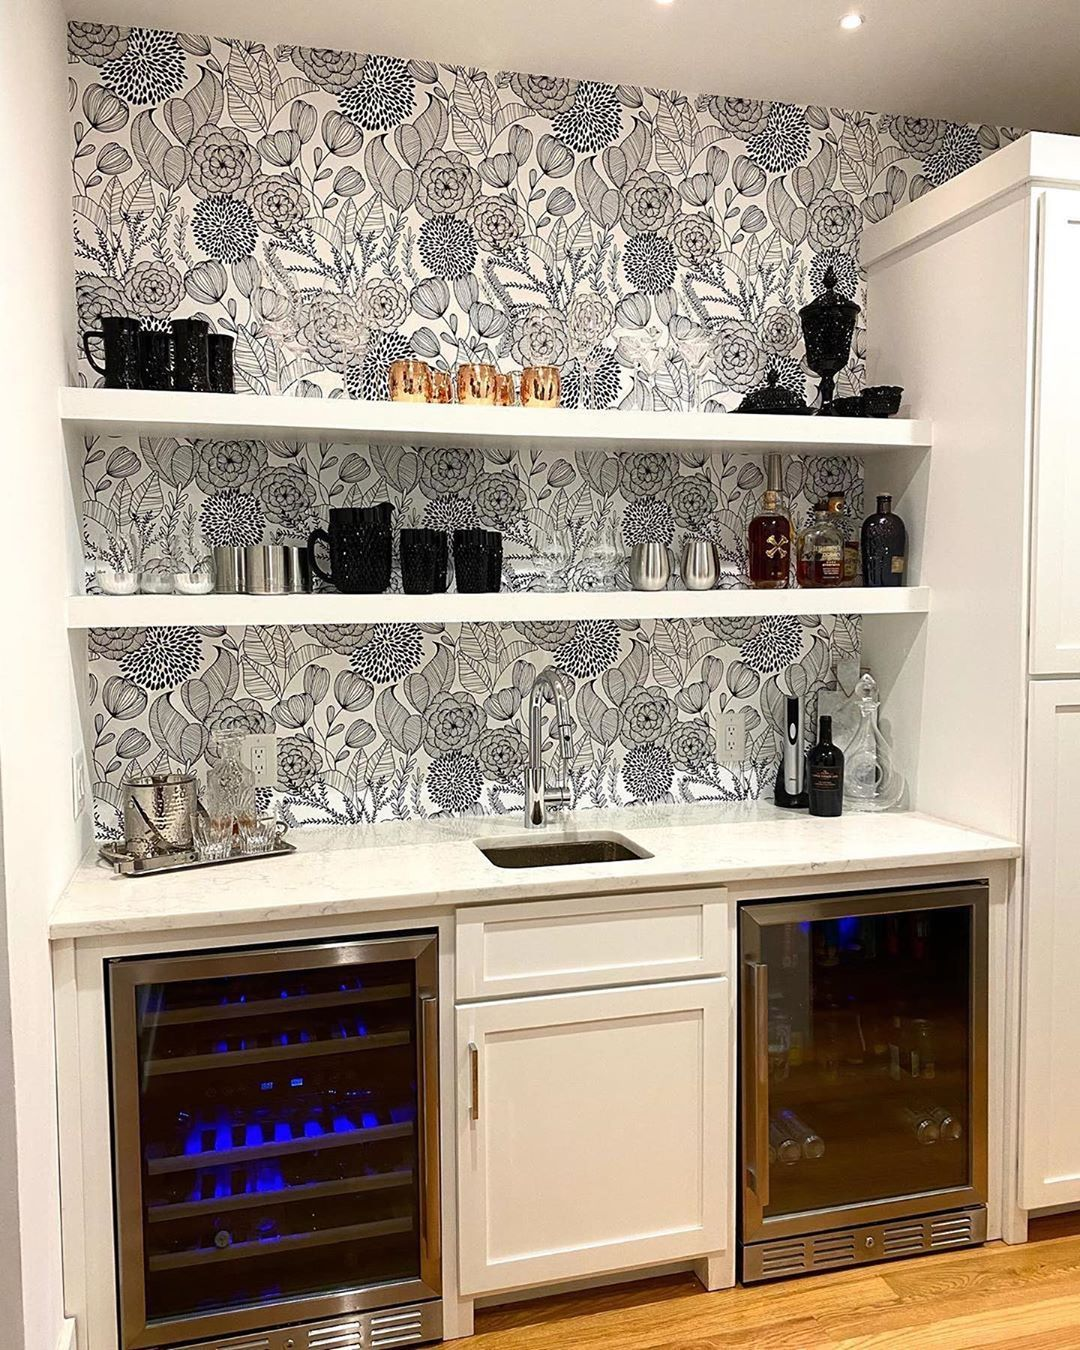 Black Secret Garden Peel And Stick Wallpaper Peel And Stick Wallpaper Black Bar Cabinet Home